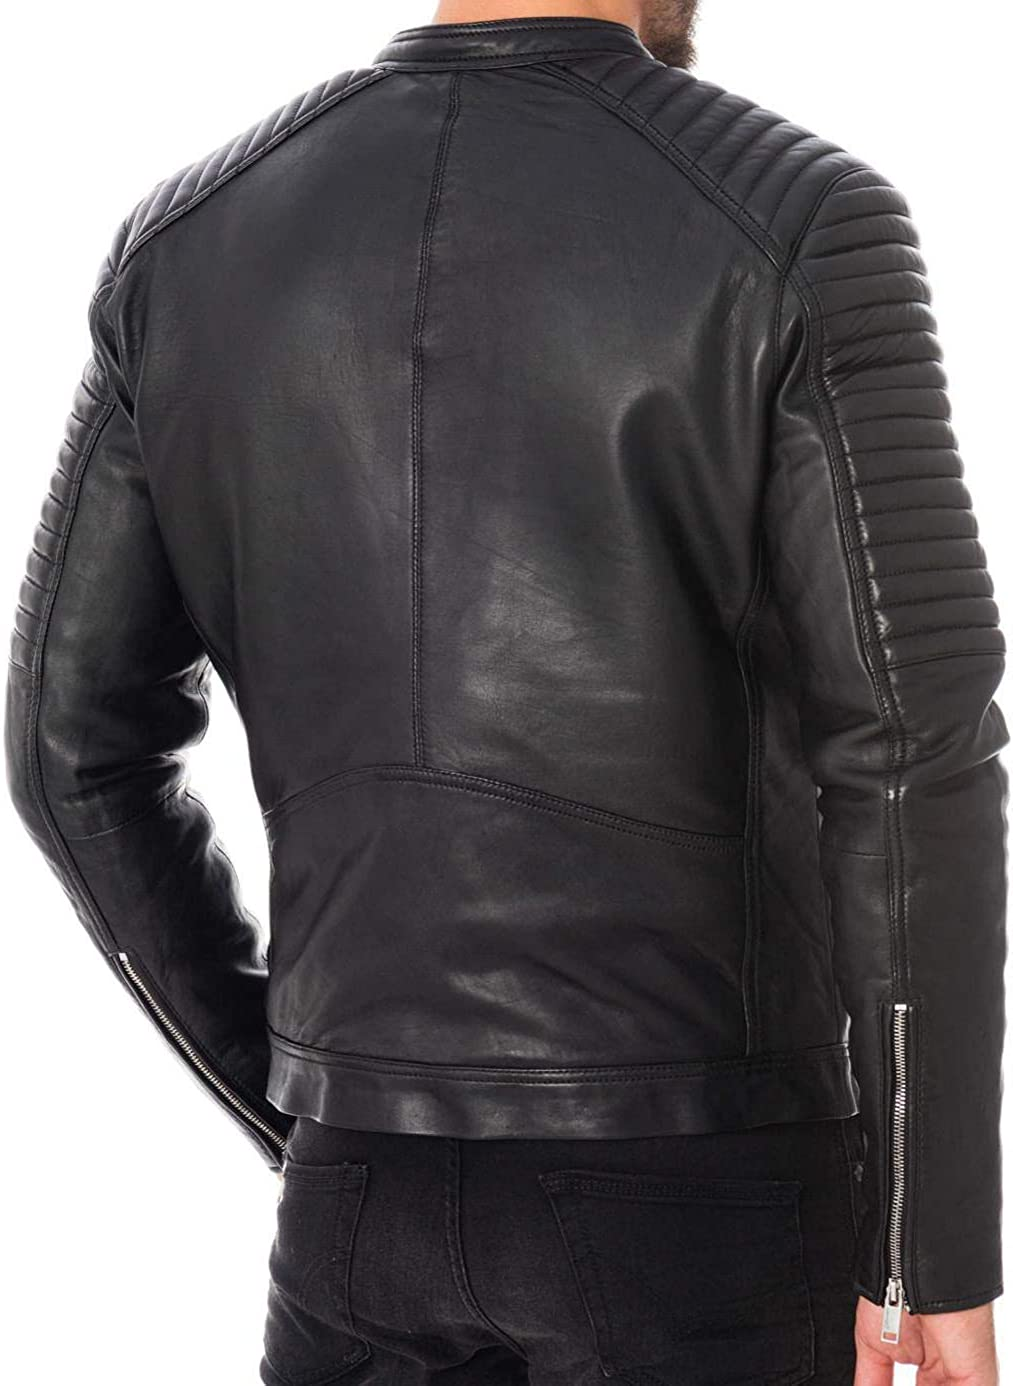 Ayesha Mens Leather Jackets Motorcycle Bomber Biker Genuine Lambskin 222